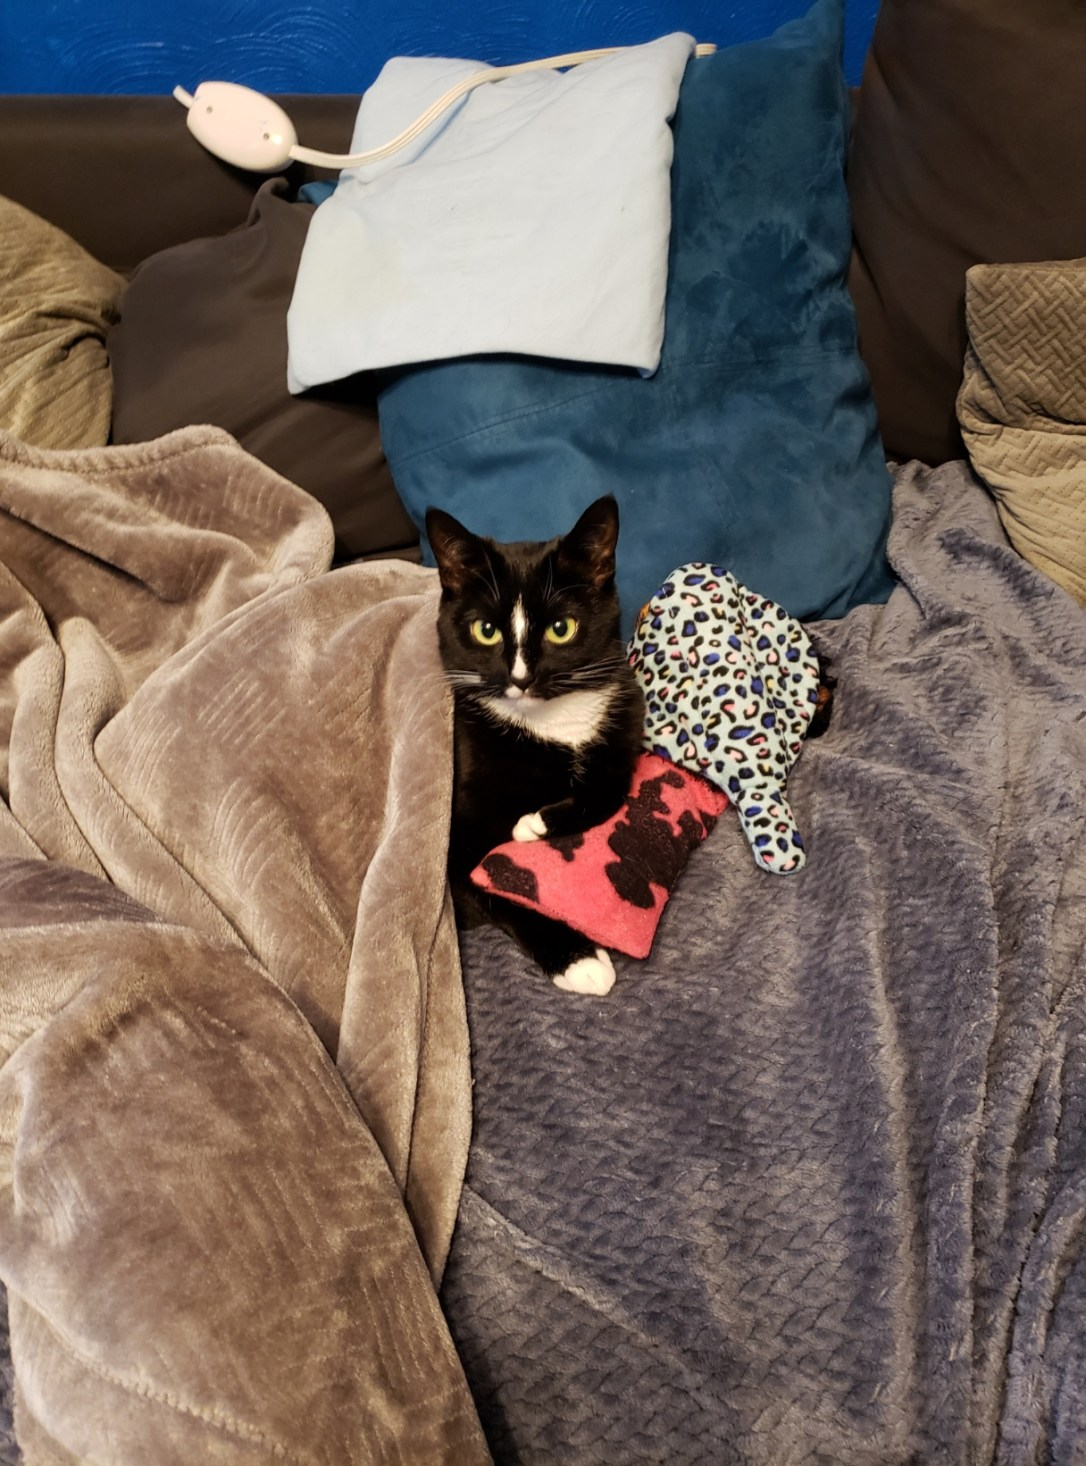 Tonks - the most interesting kitten in the world